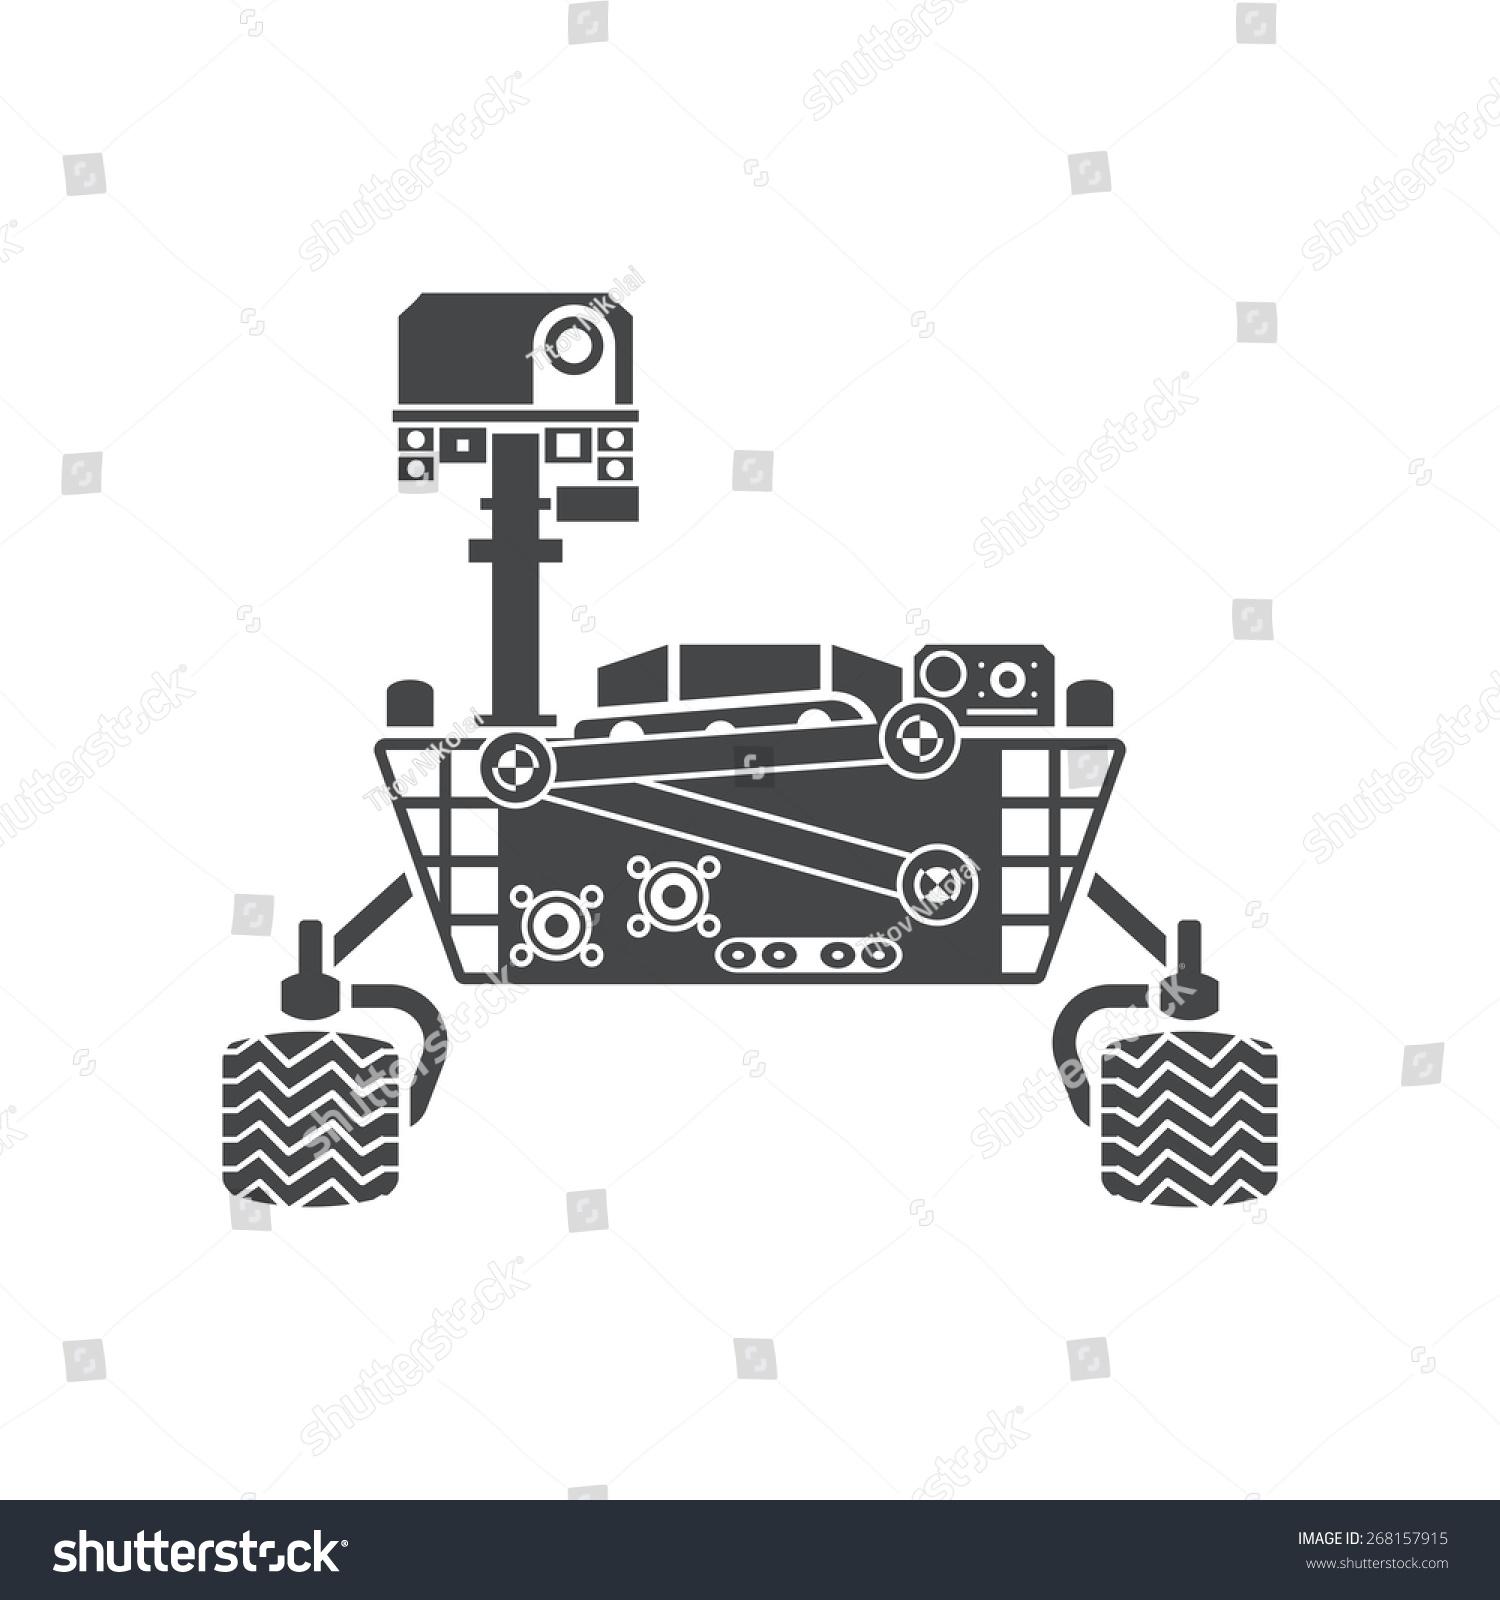 mars rover vector - photo #2